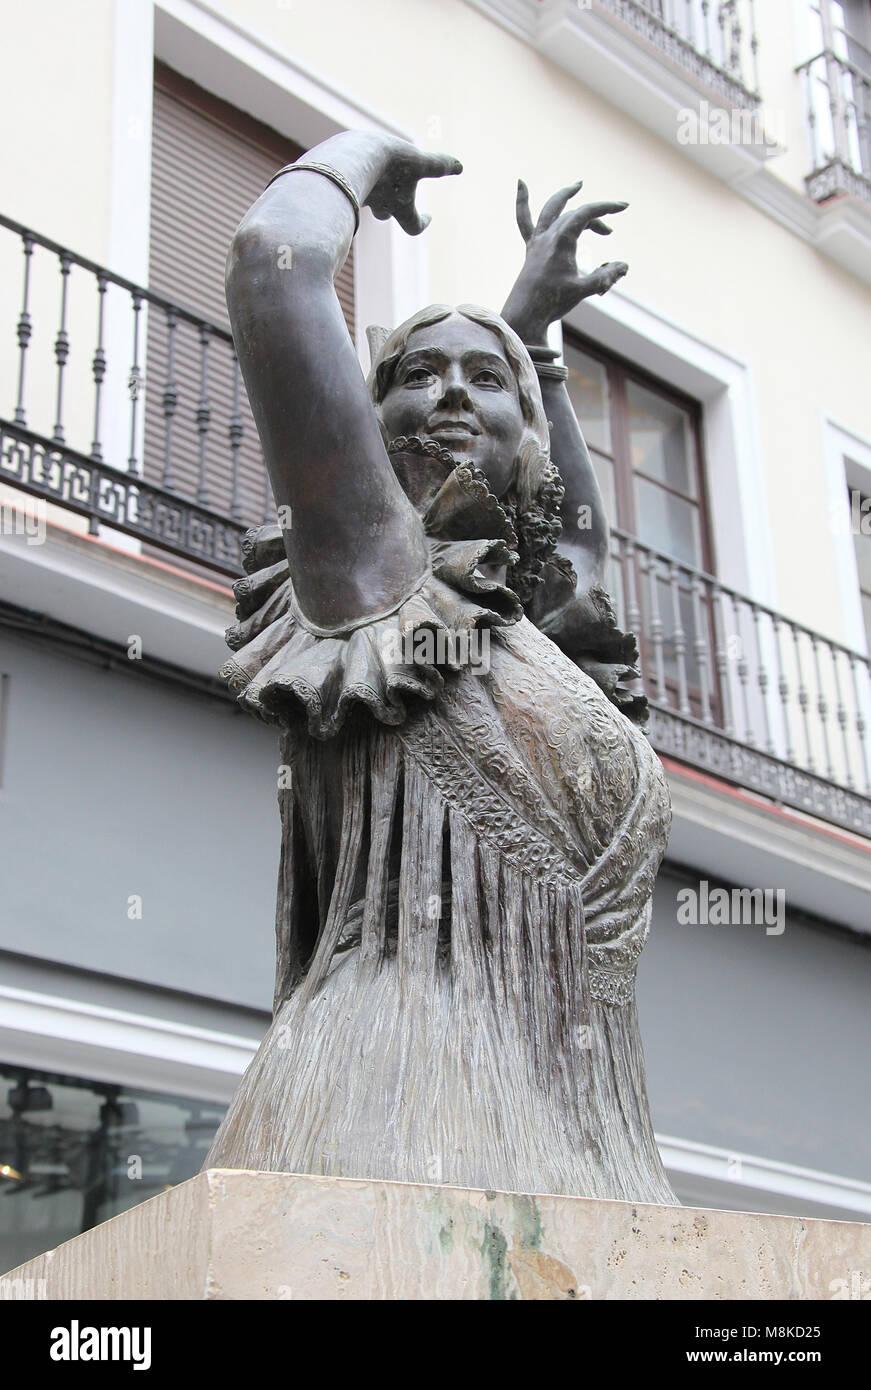 Monument to Pastora Imperio in Seville - Stock Image